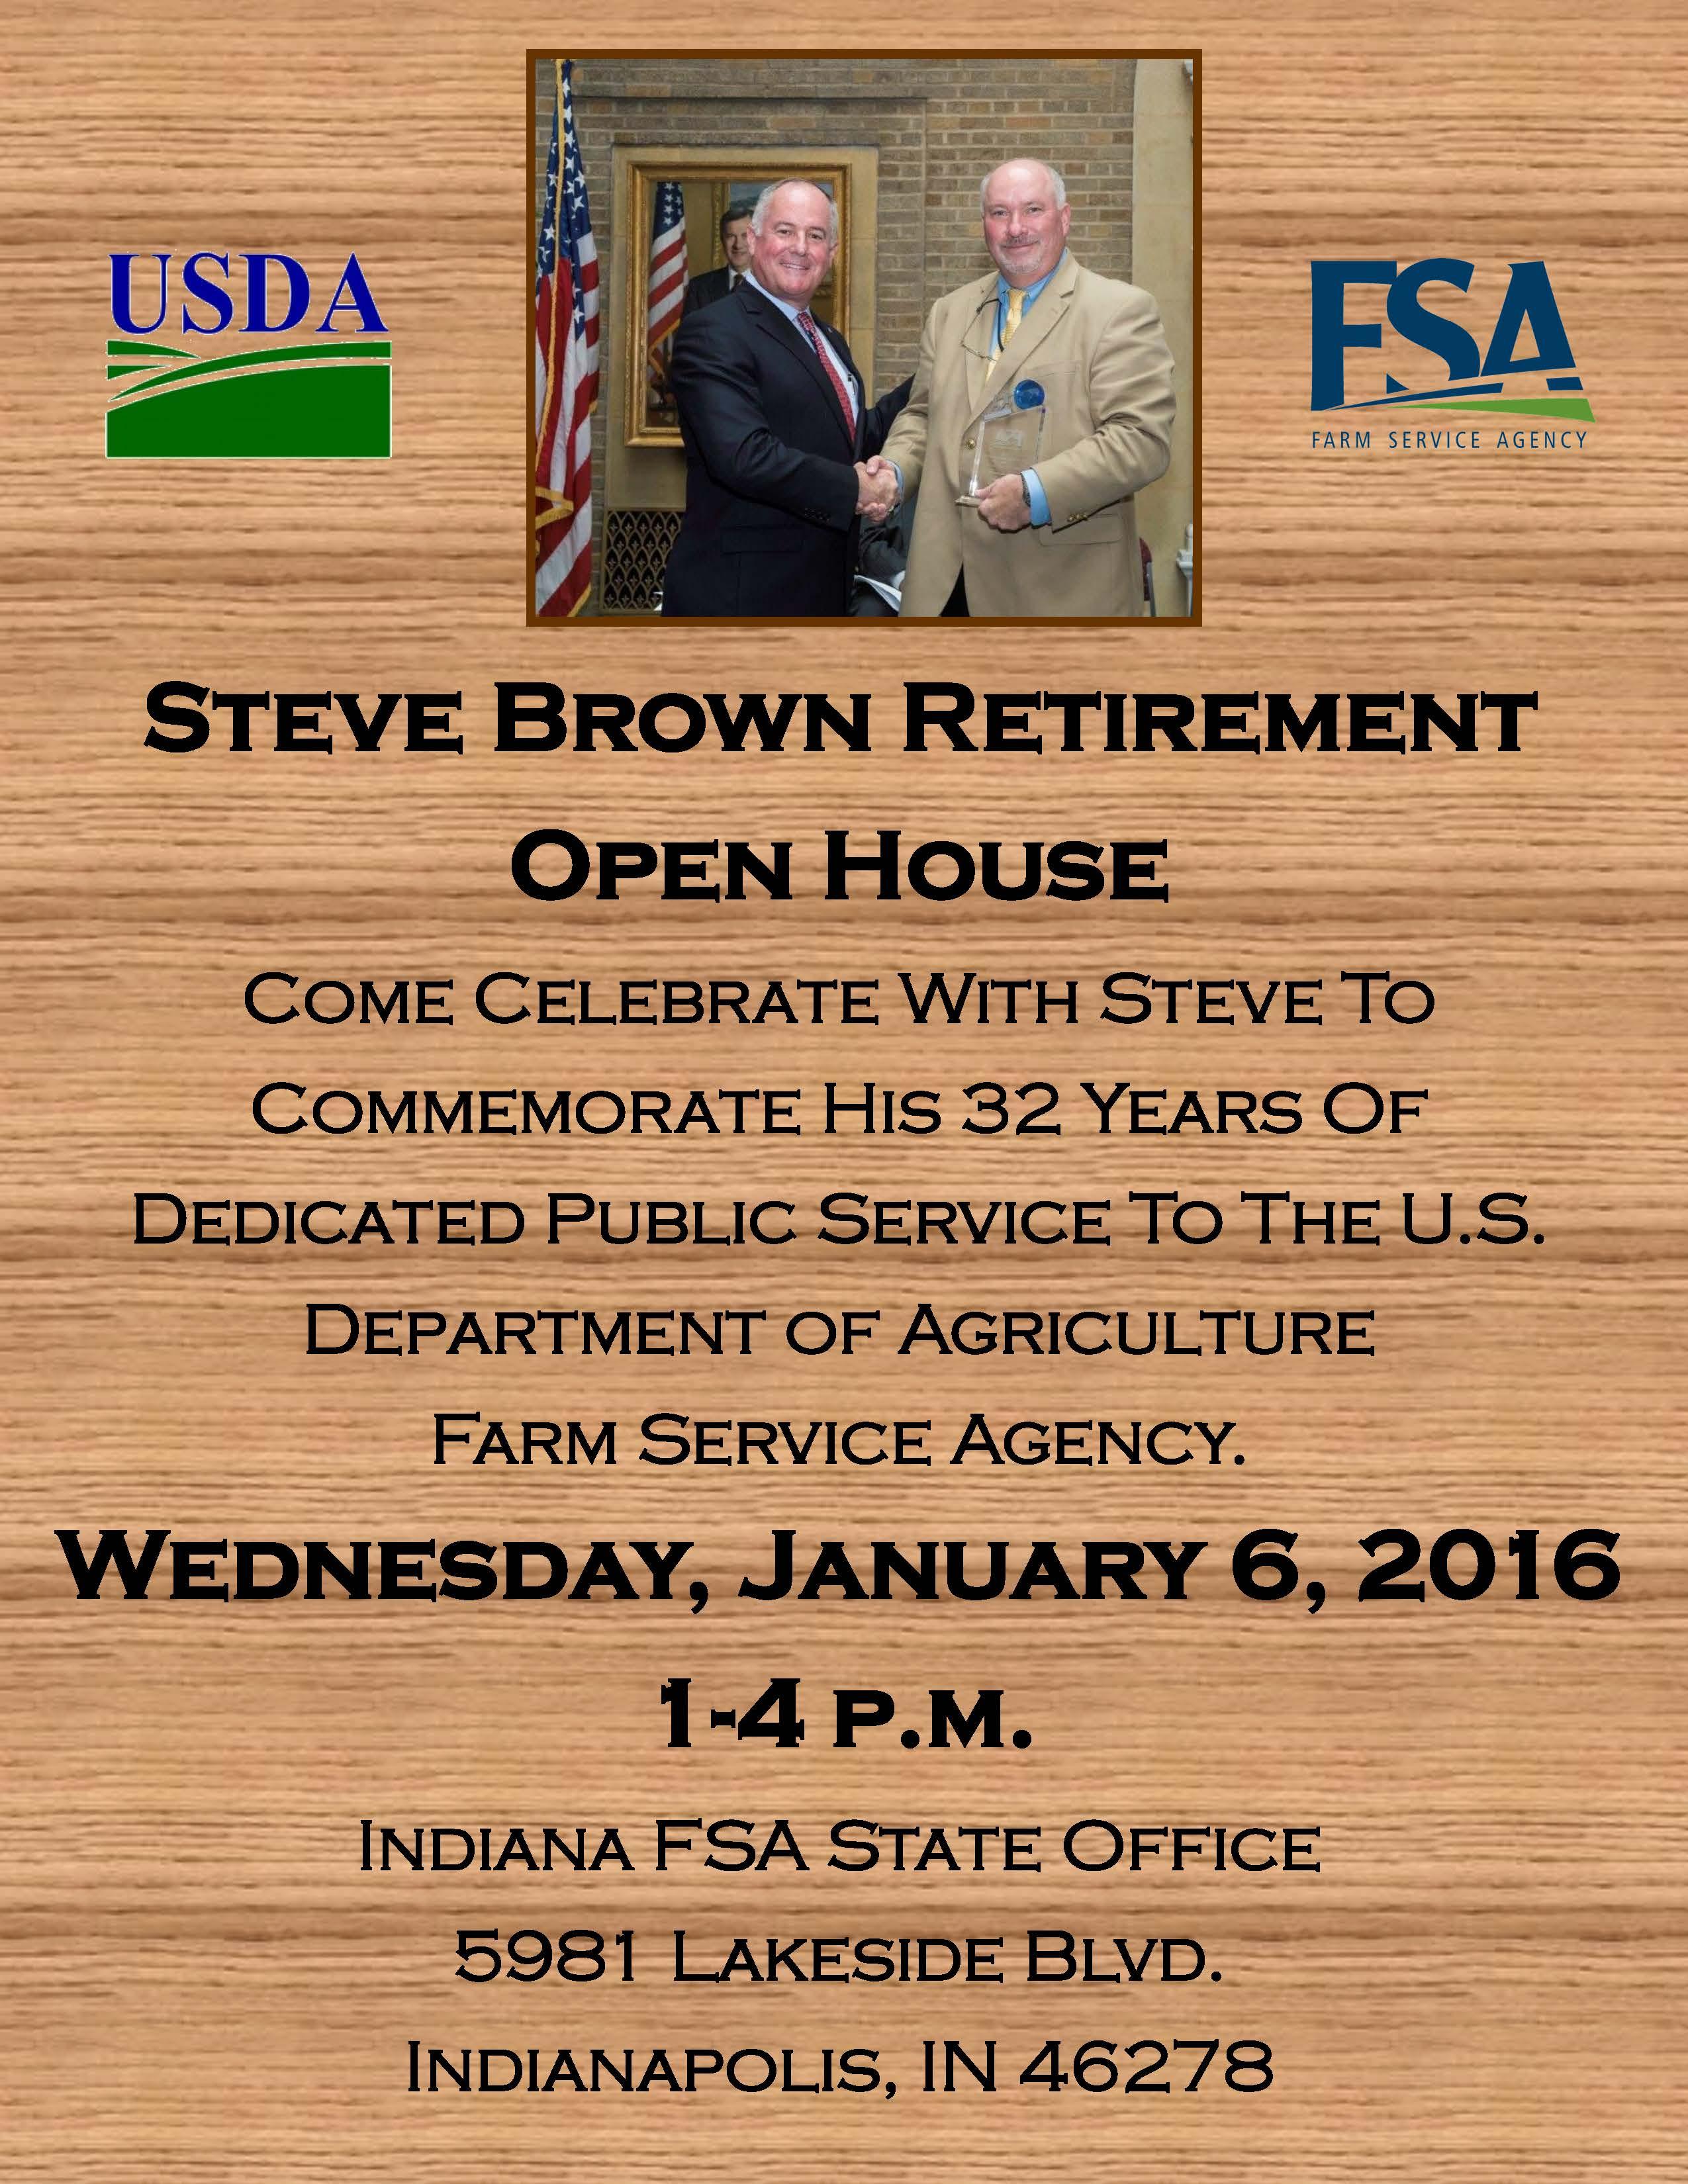 Steve Brown Open House Flyer 1 6 16